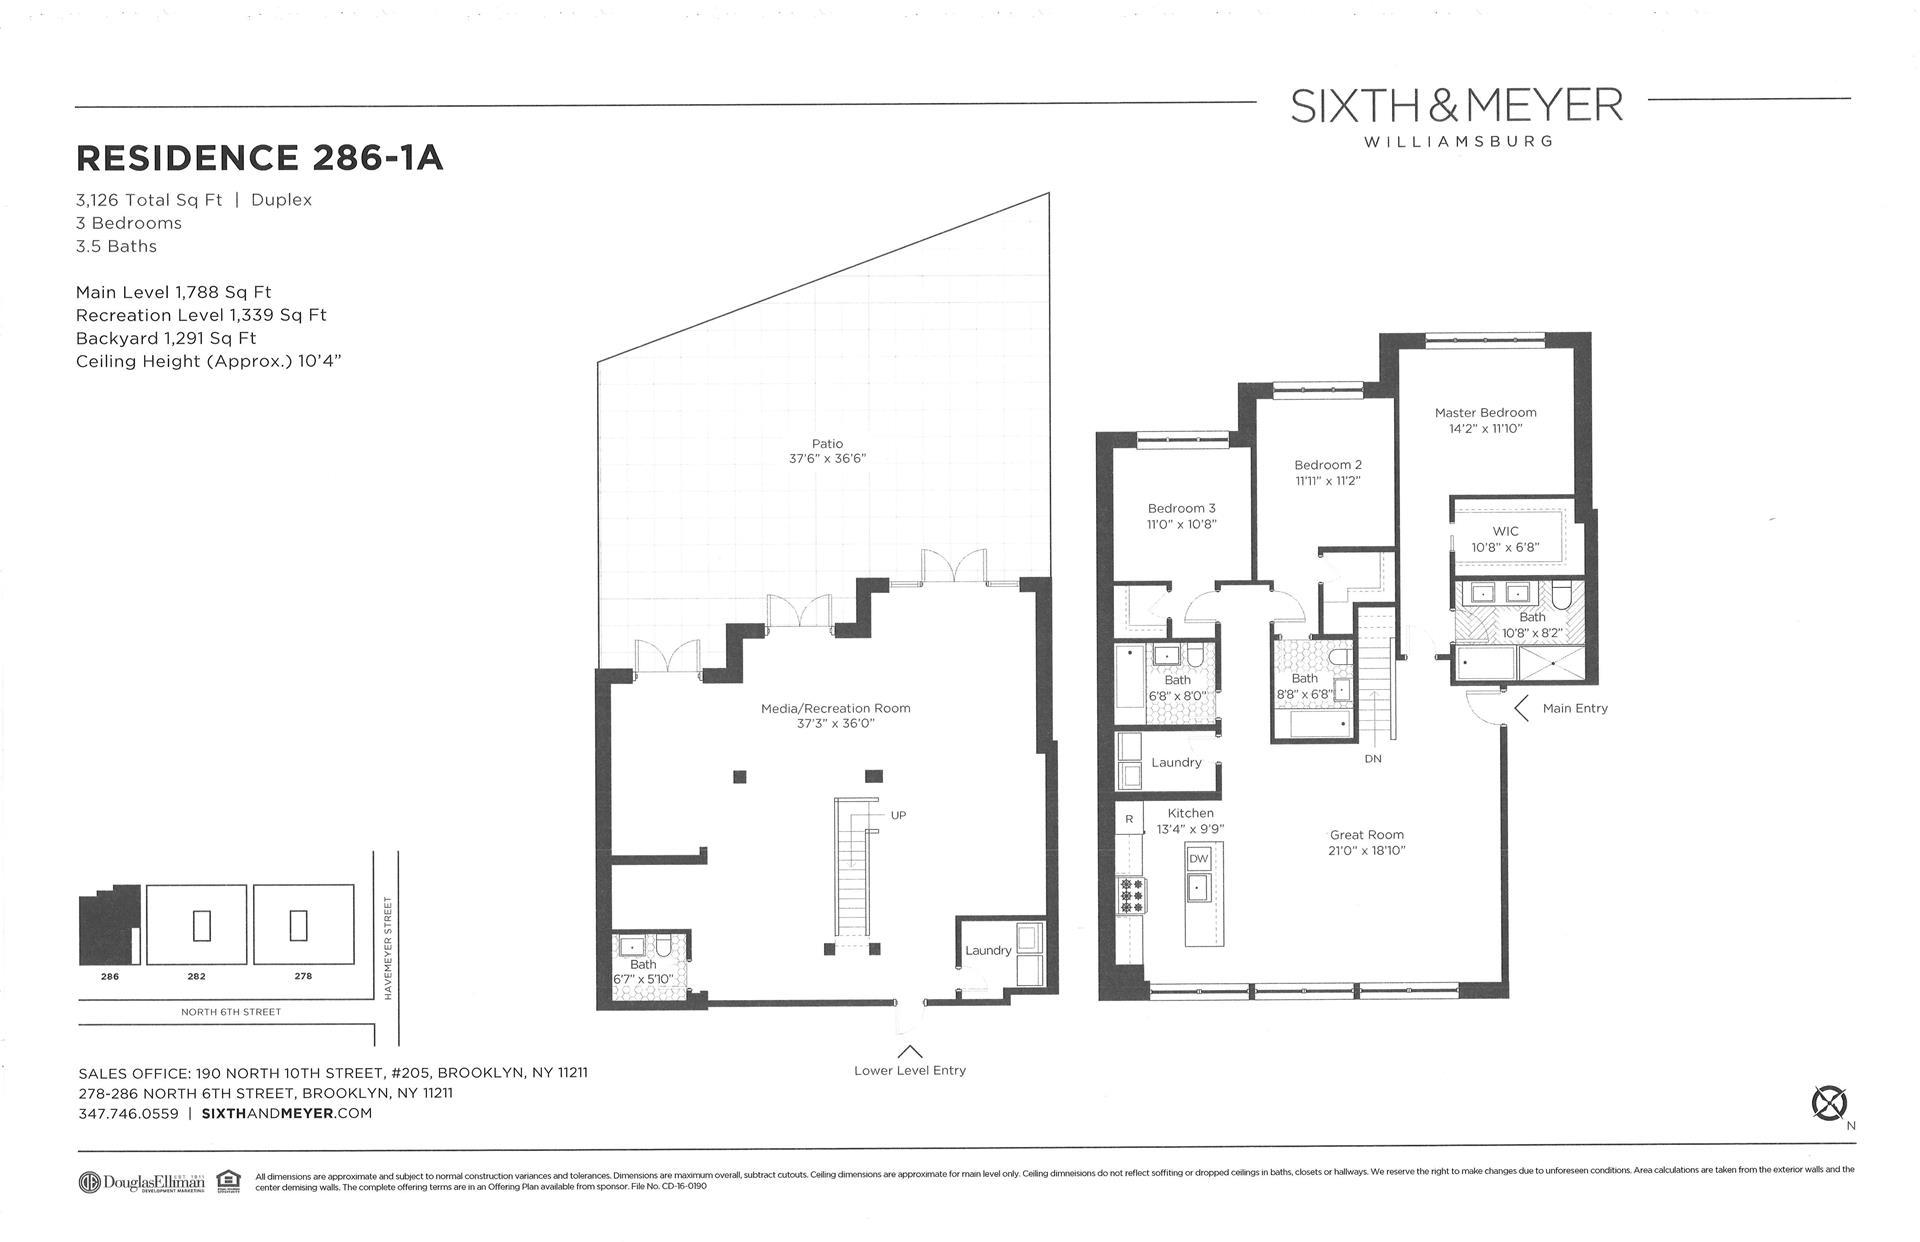 Floor plan of Sixth & Meyer, 278-286 North 6th St, 286/1A - Williamsburg, New York